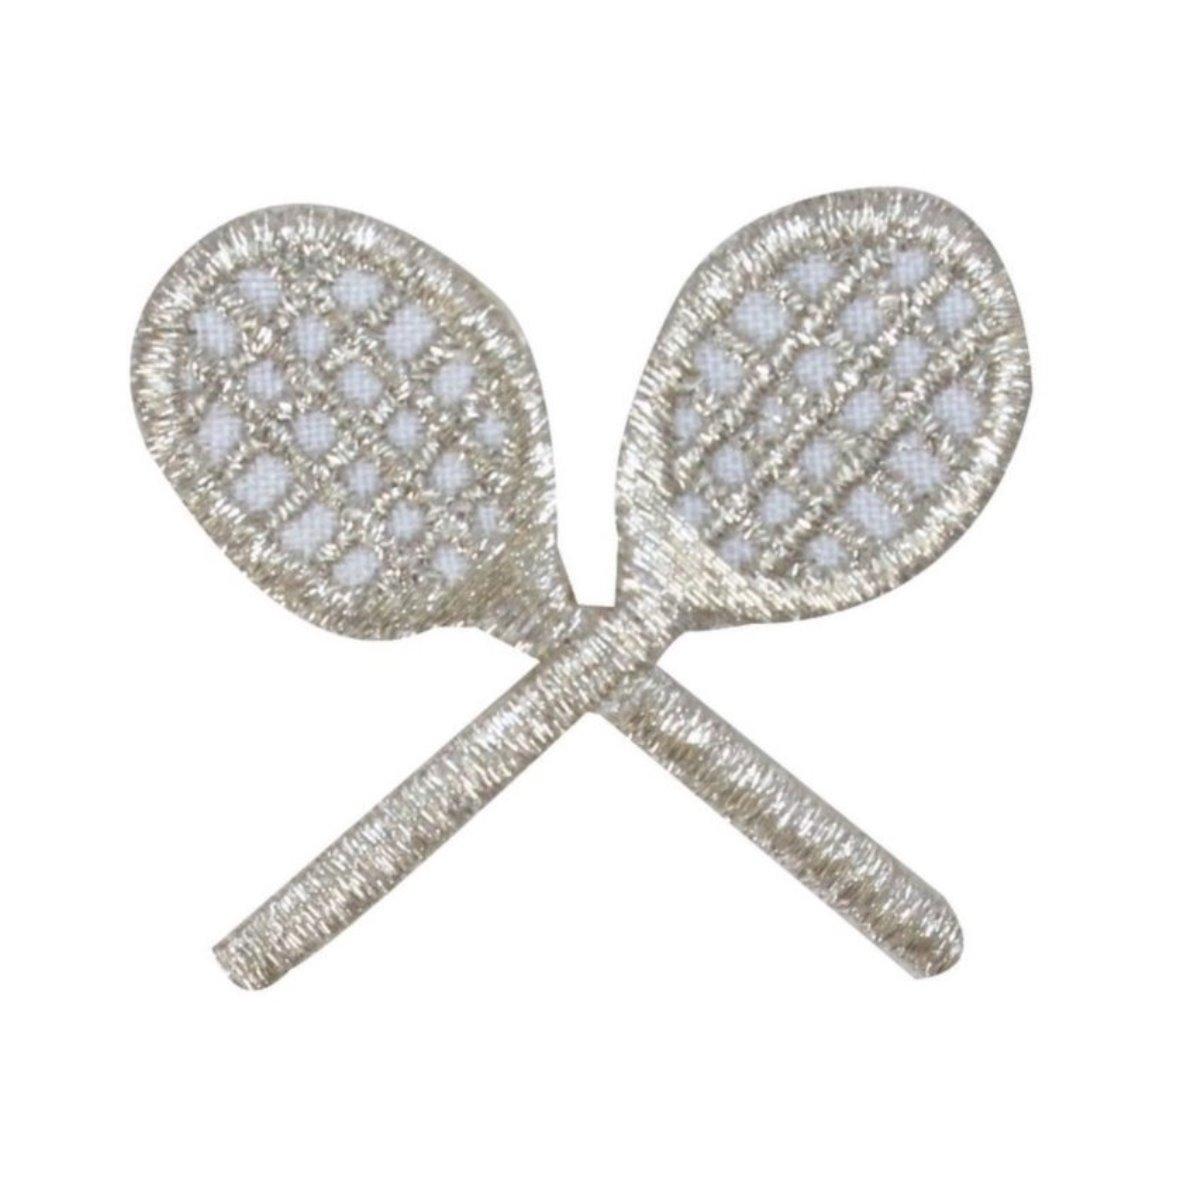 2 Silver Metal Tennis Racket Sports Card Making Scrapbook Craft Embellishments